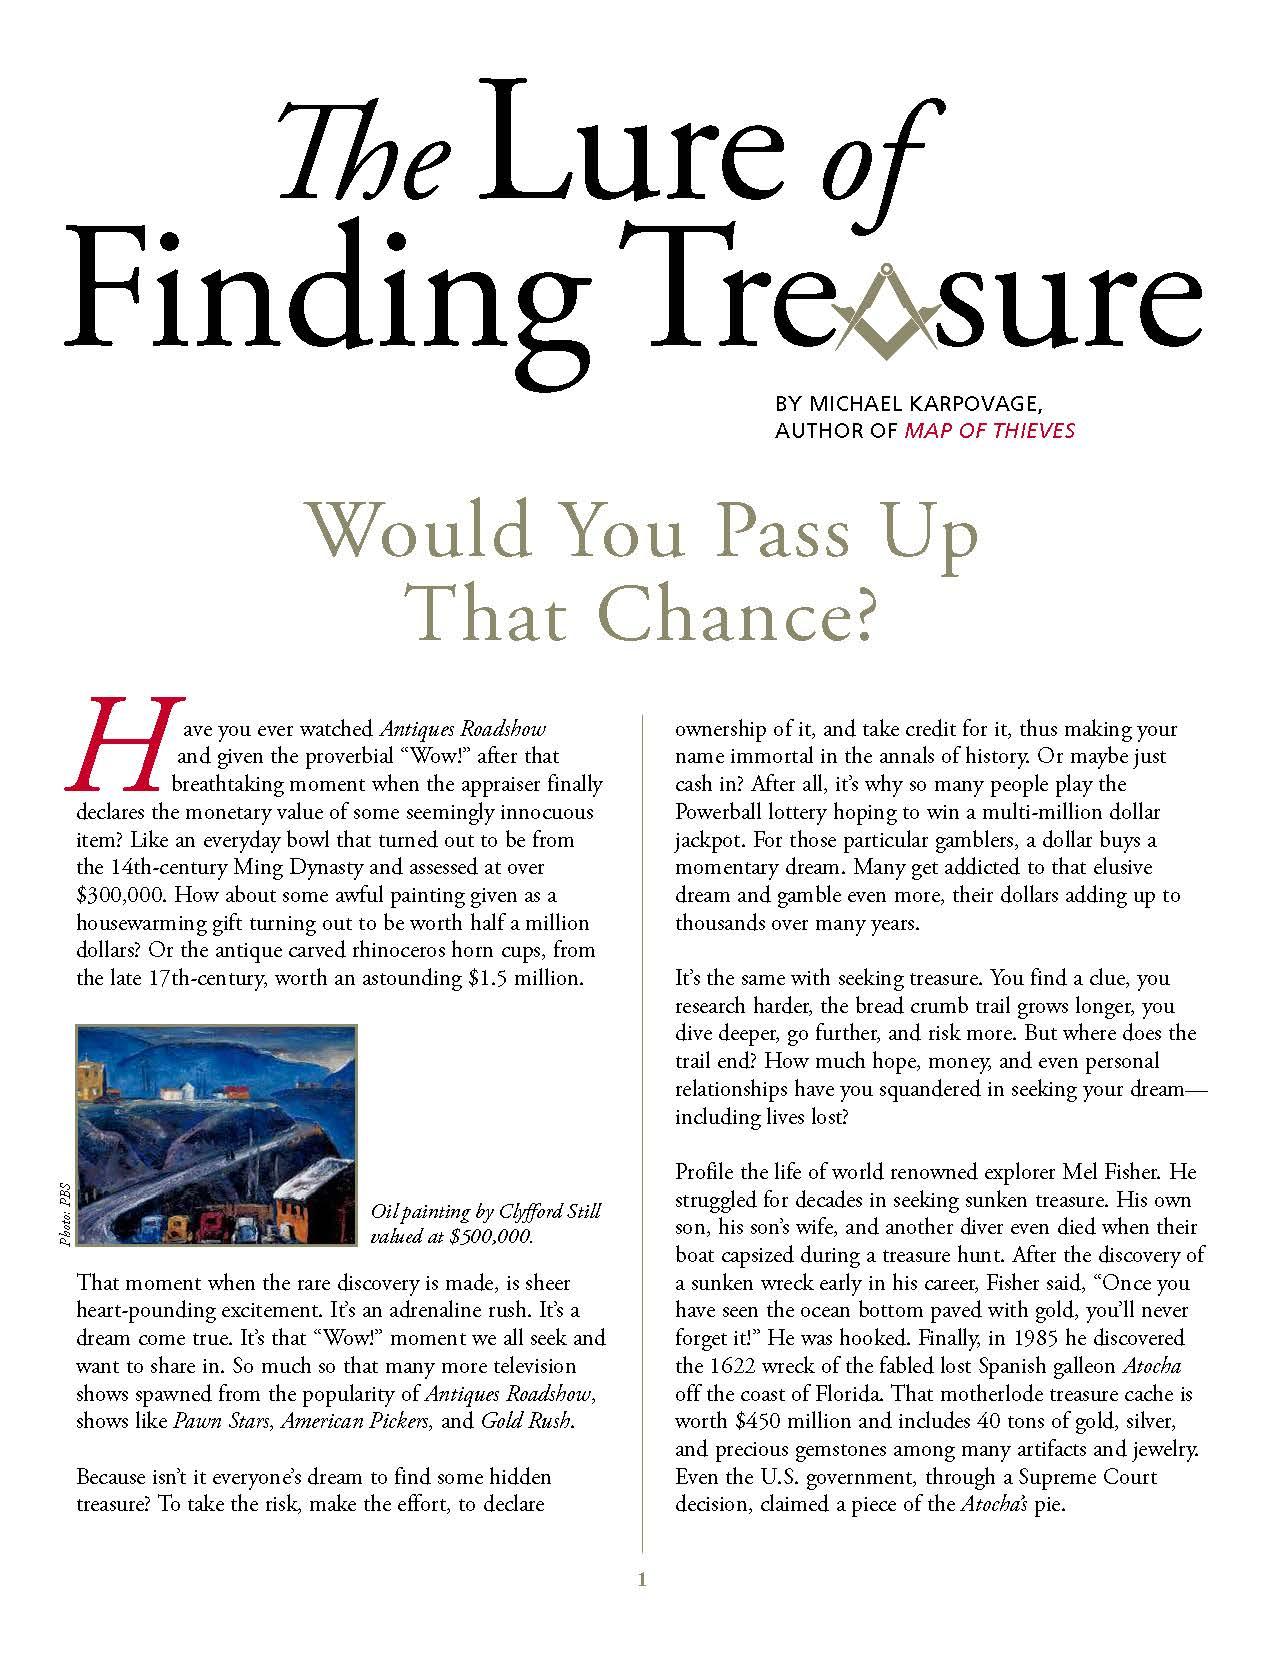 Finding-Treasure-article_Page_1.jpg